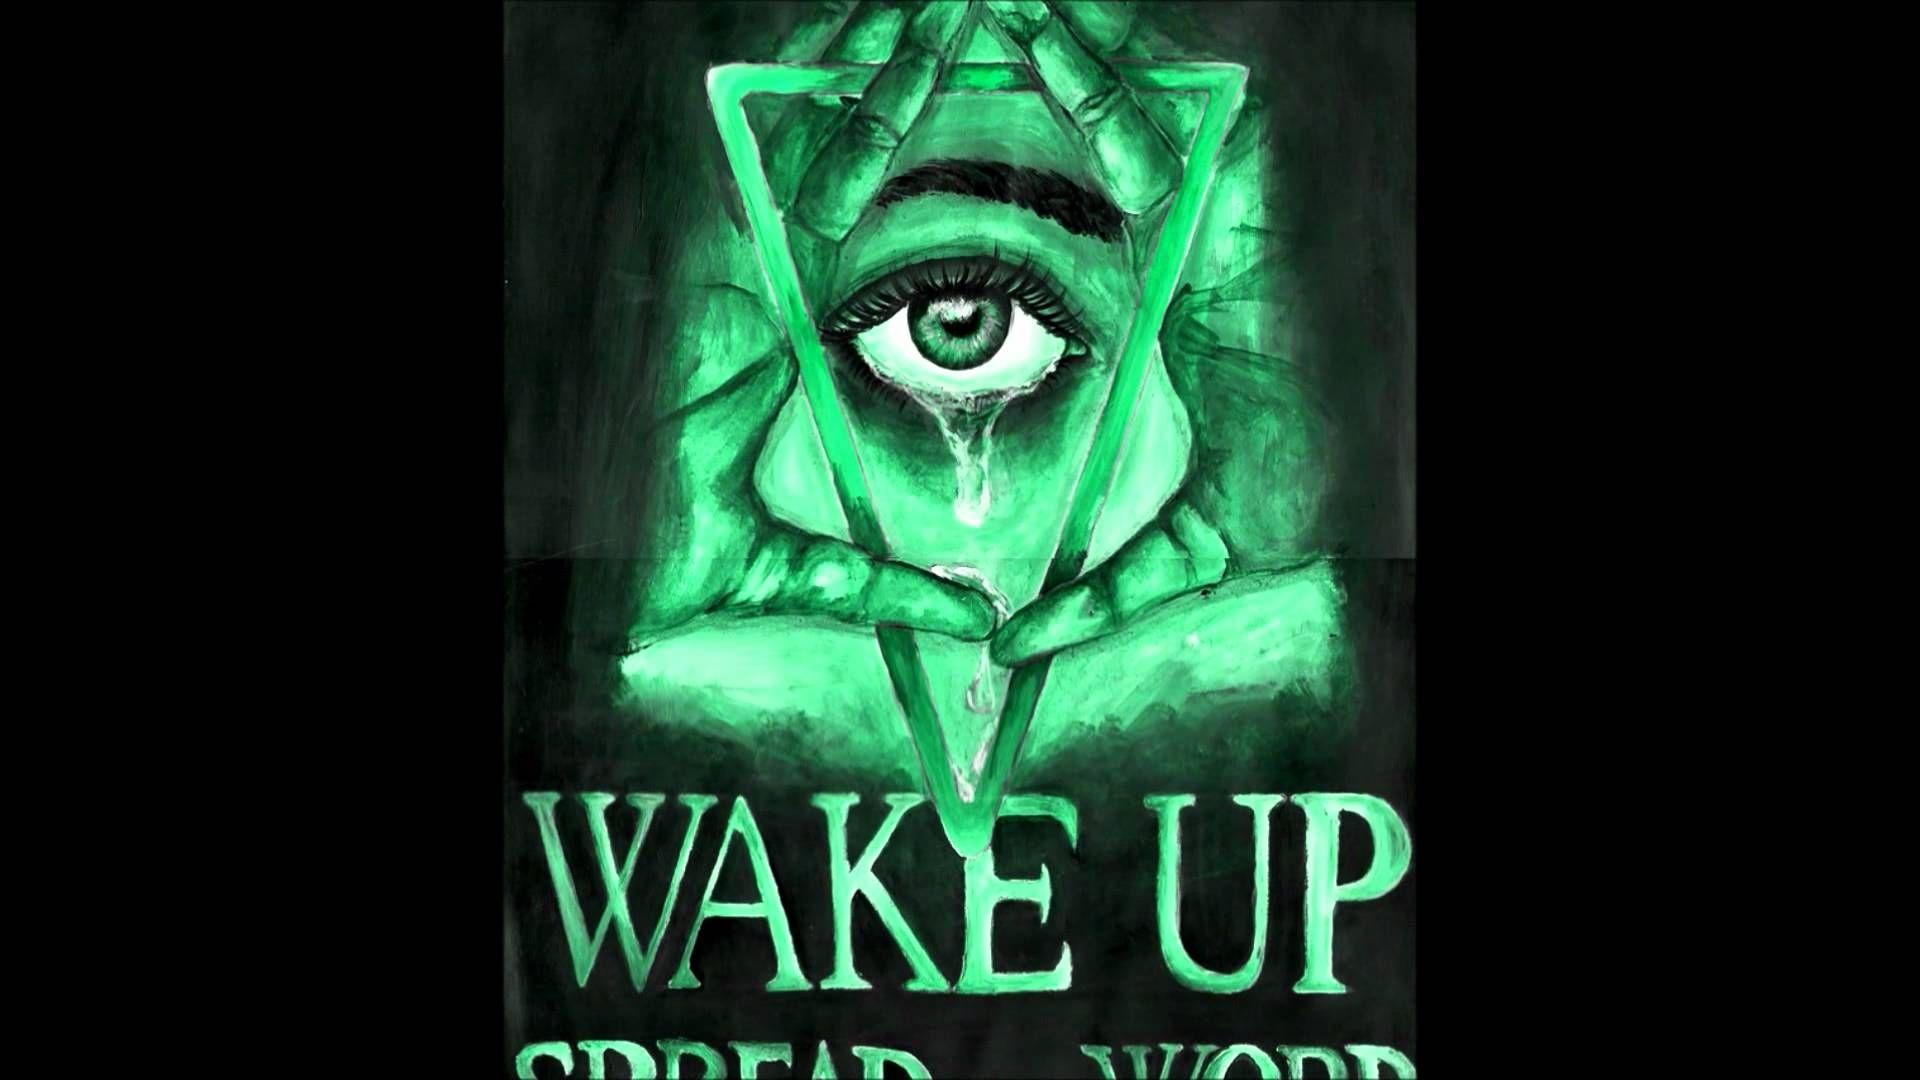 Pin By Woodstock On Woodshock Illuminati Trippy Wallpaper